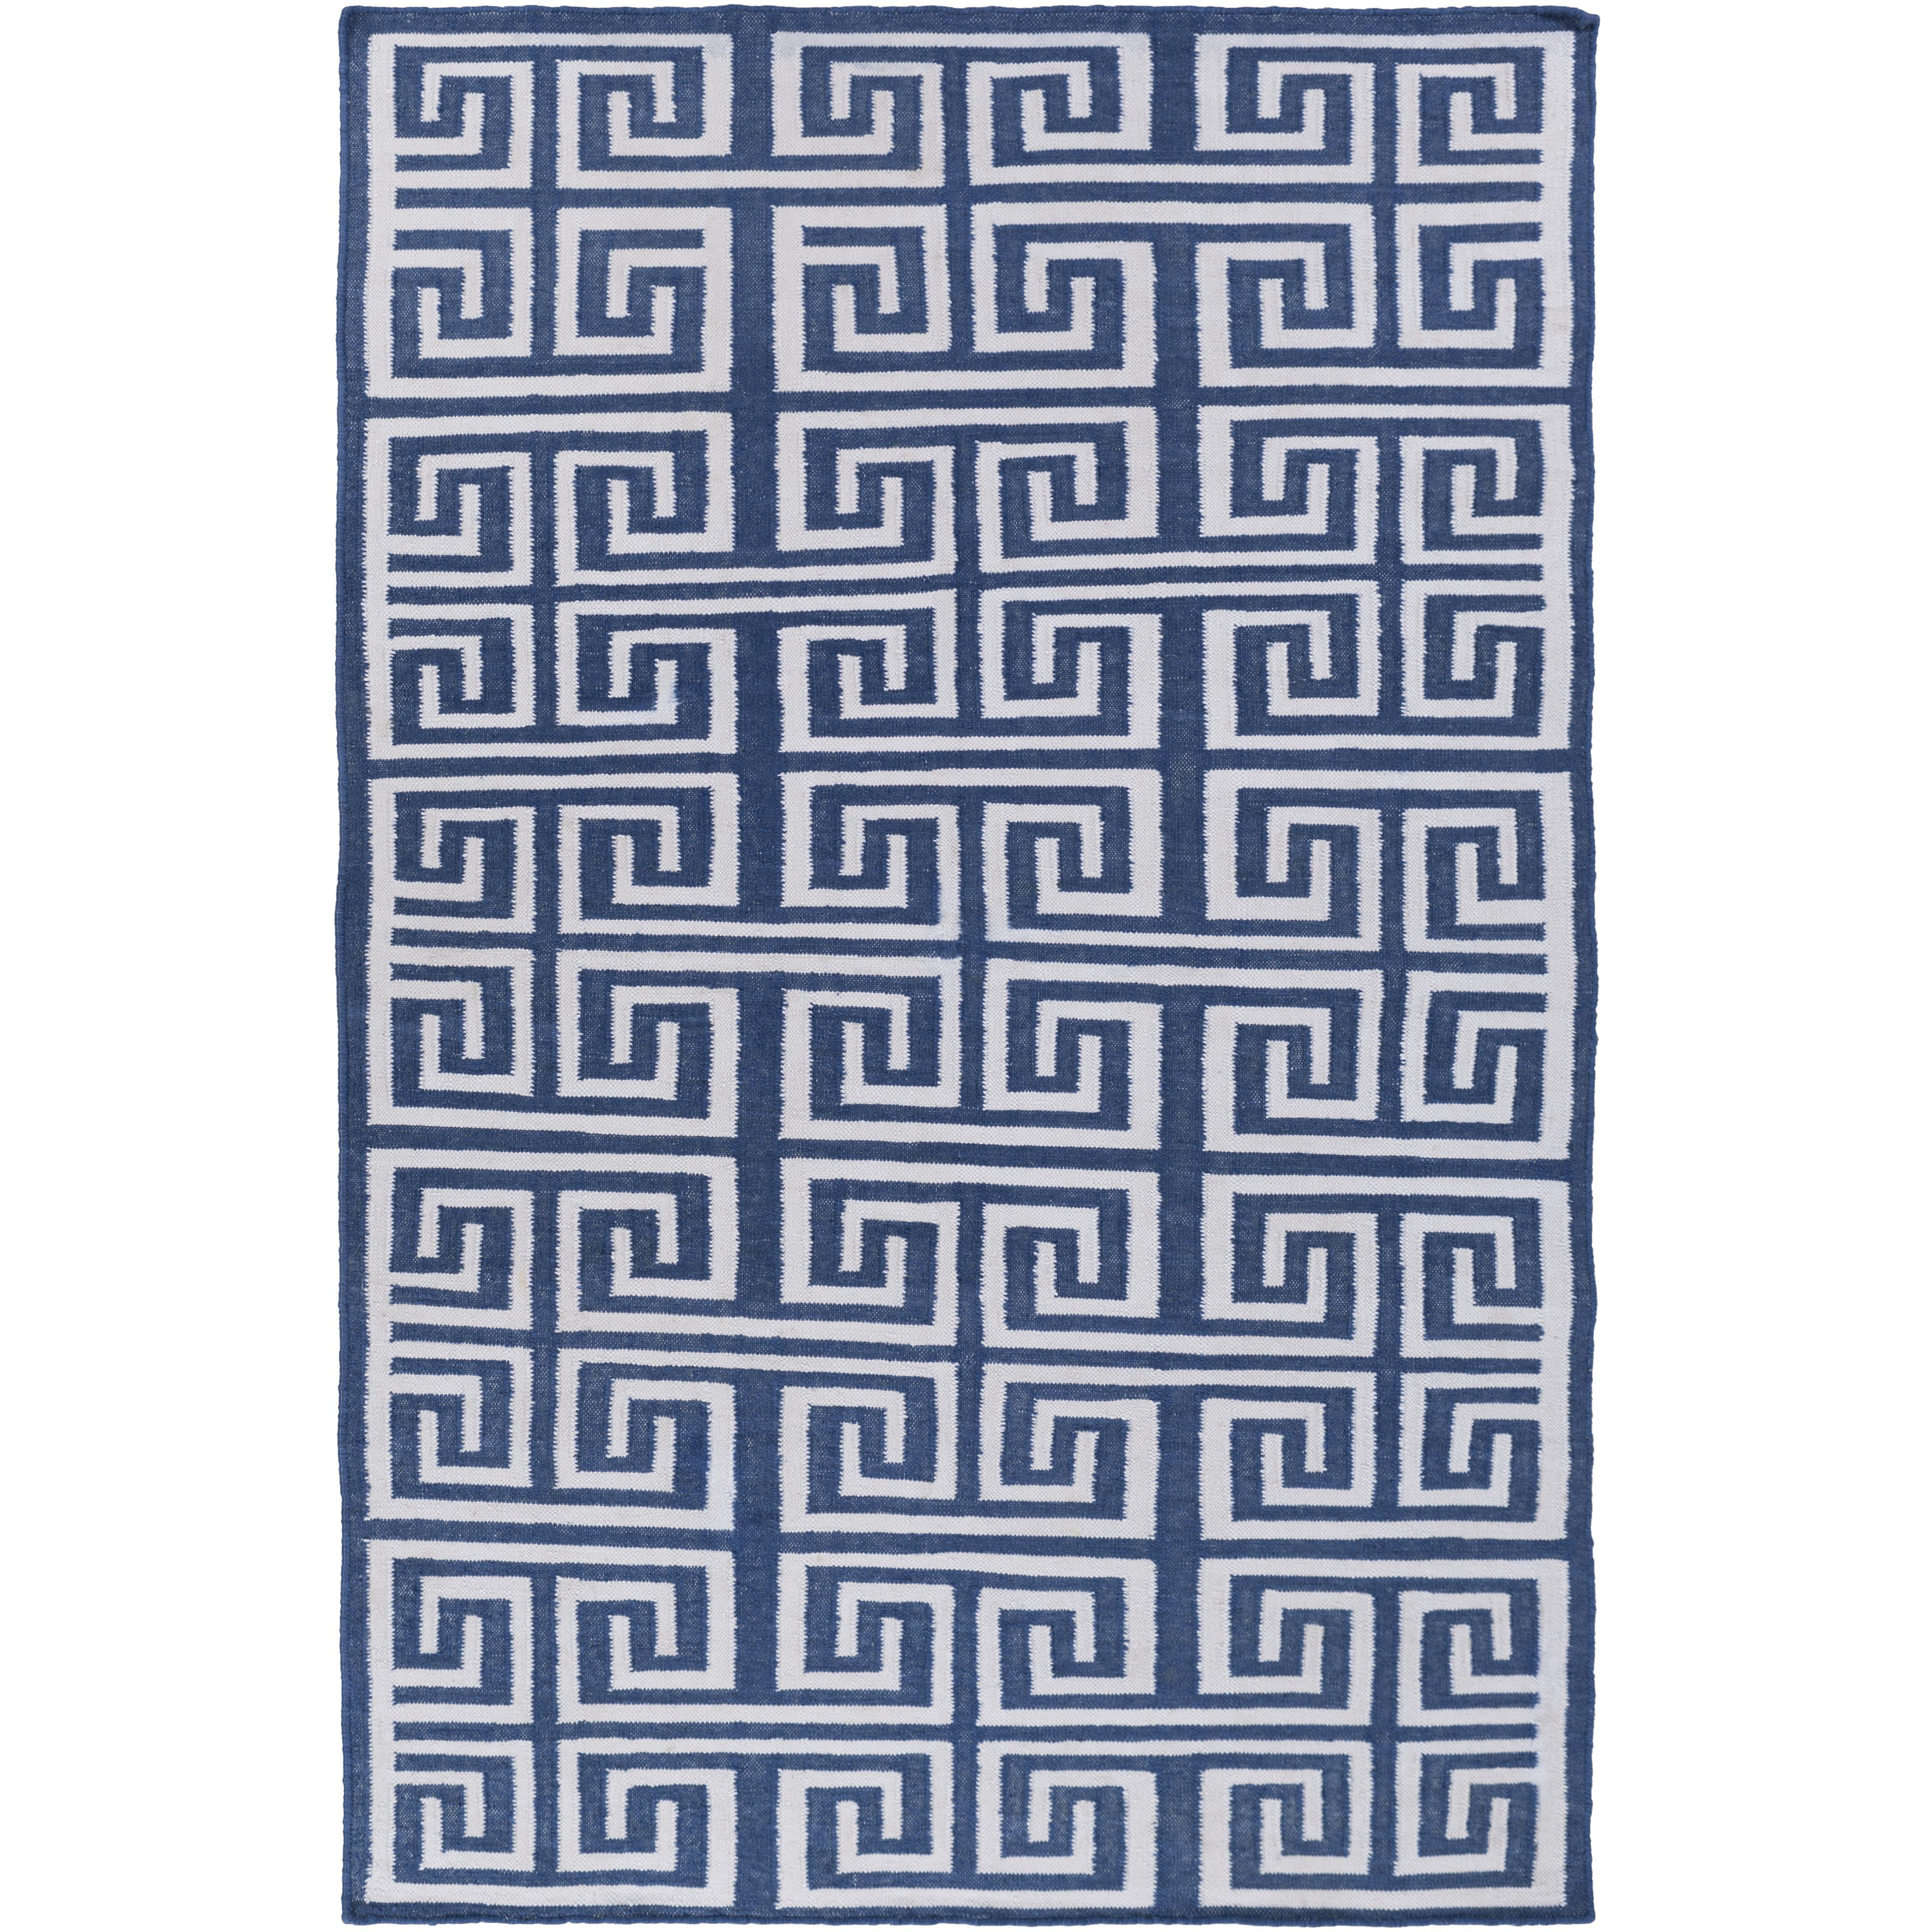 Surya Rugs Lagoon 2' x 3' - Item Number: LGO2025-23